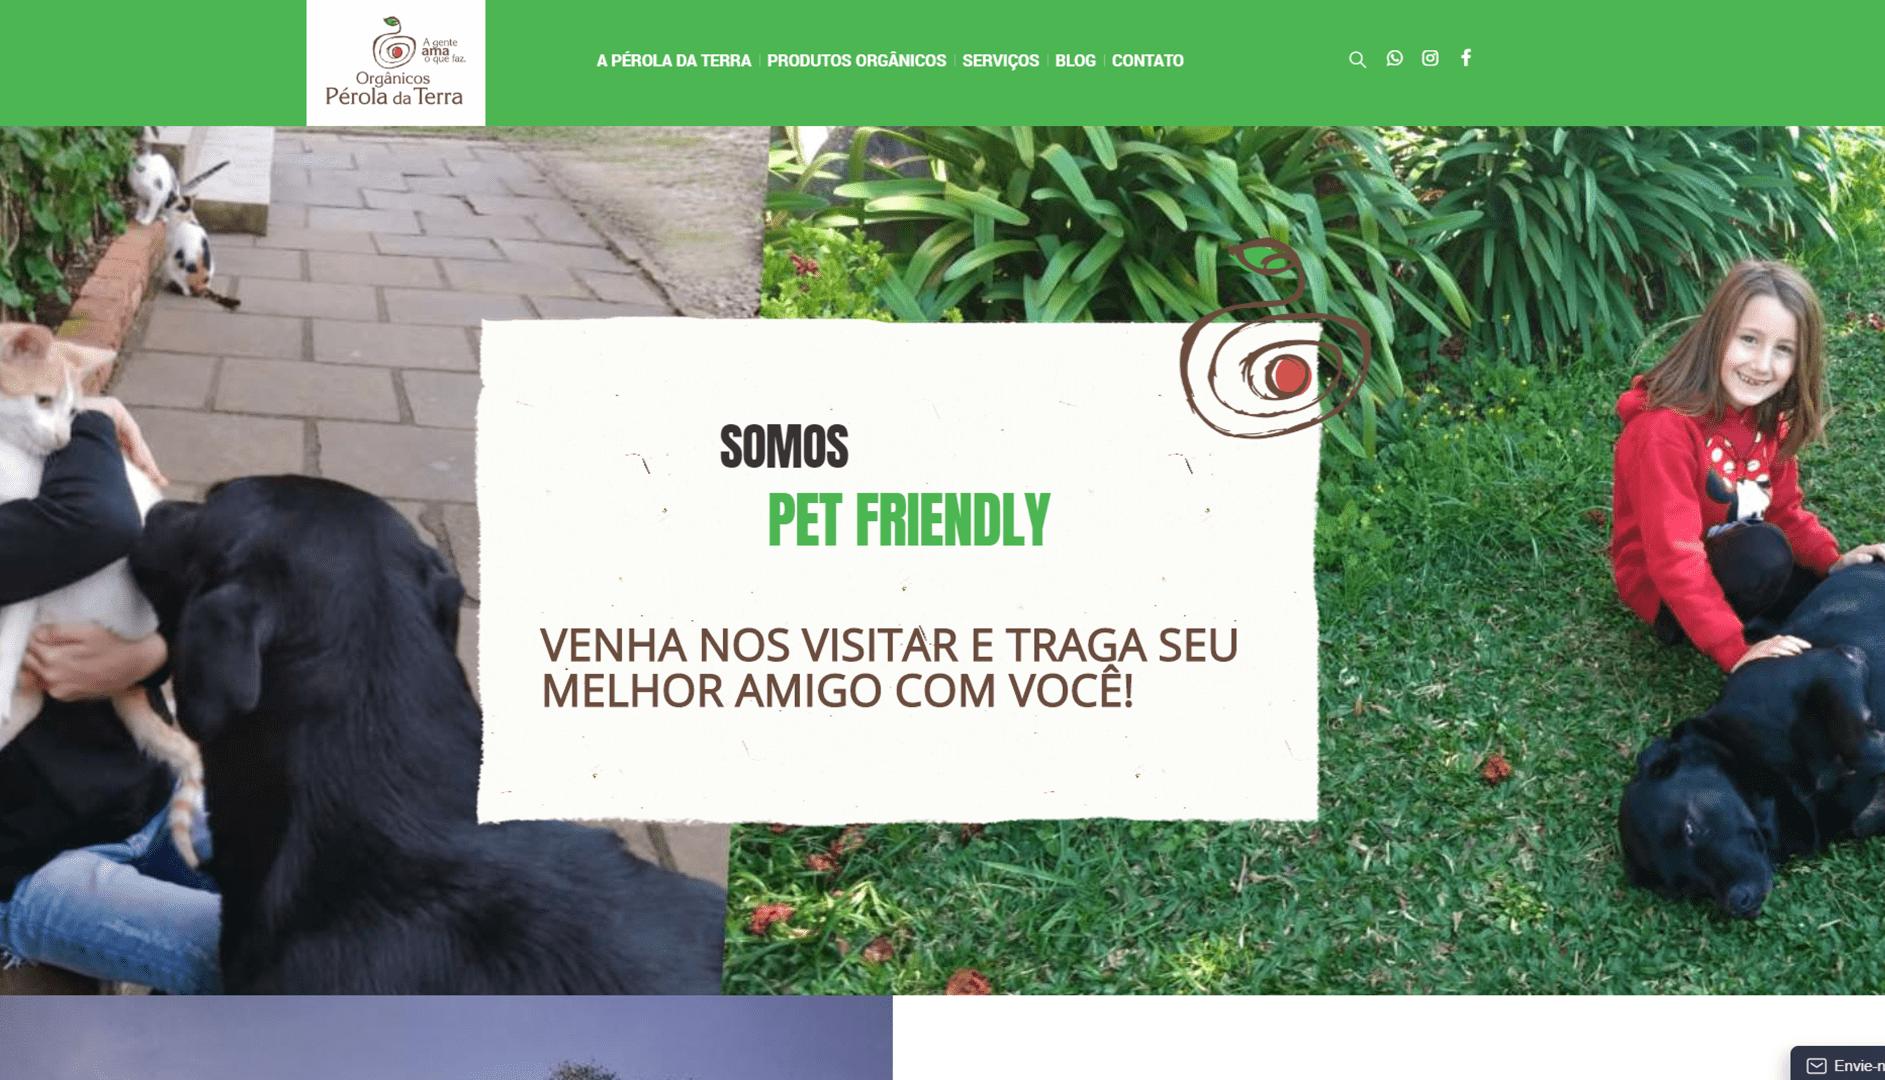 https://www.6i.com.br/case/prola-da-terra/